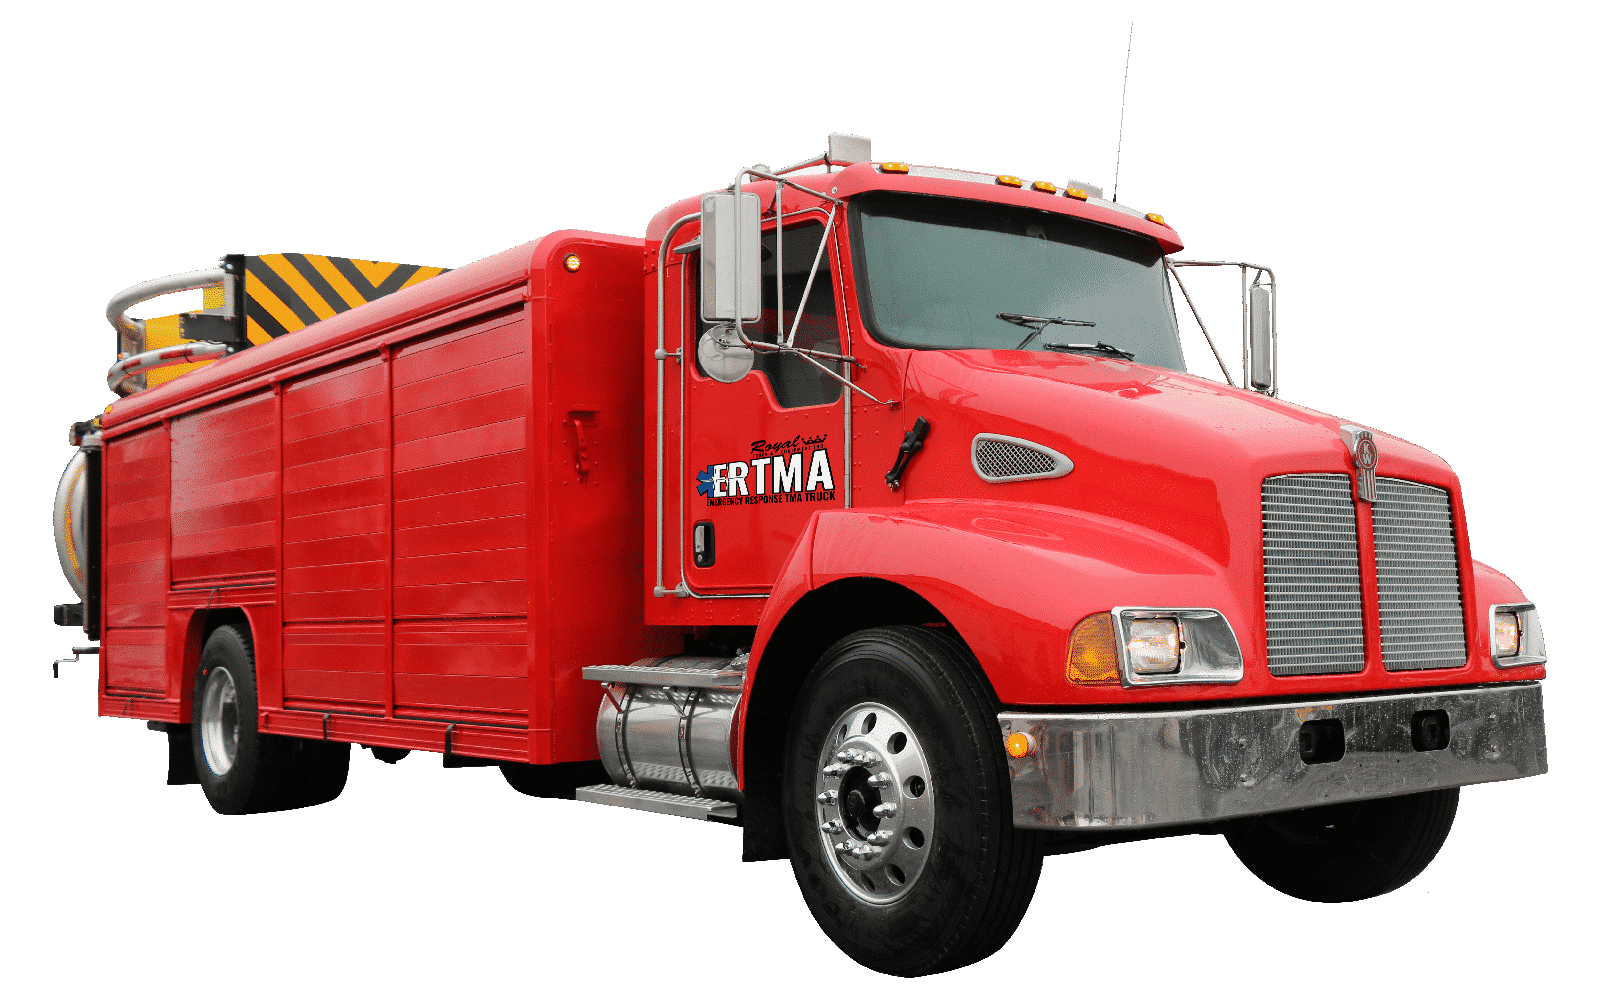 Emergency Response TMA Truck